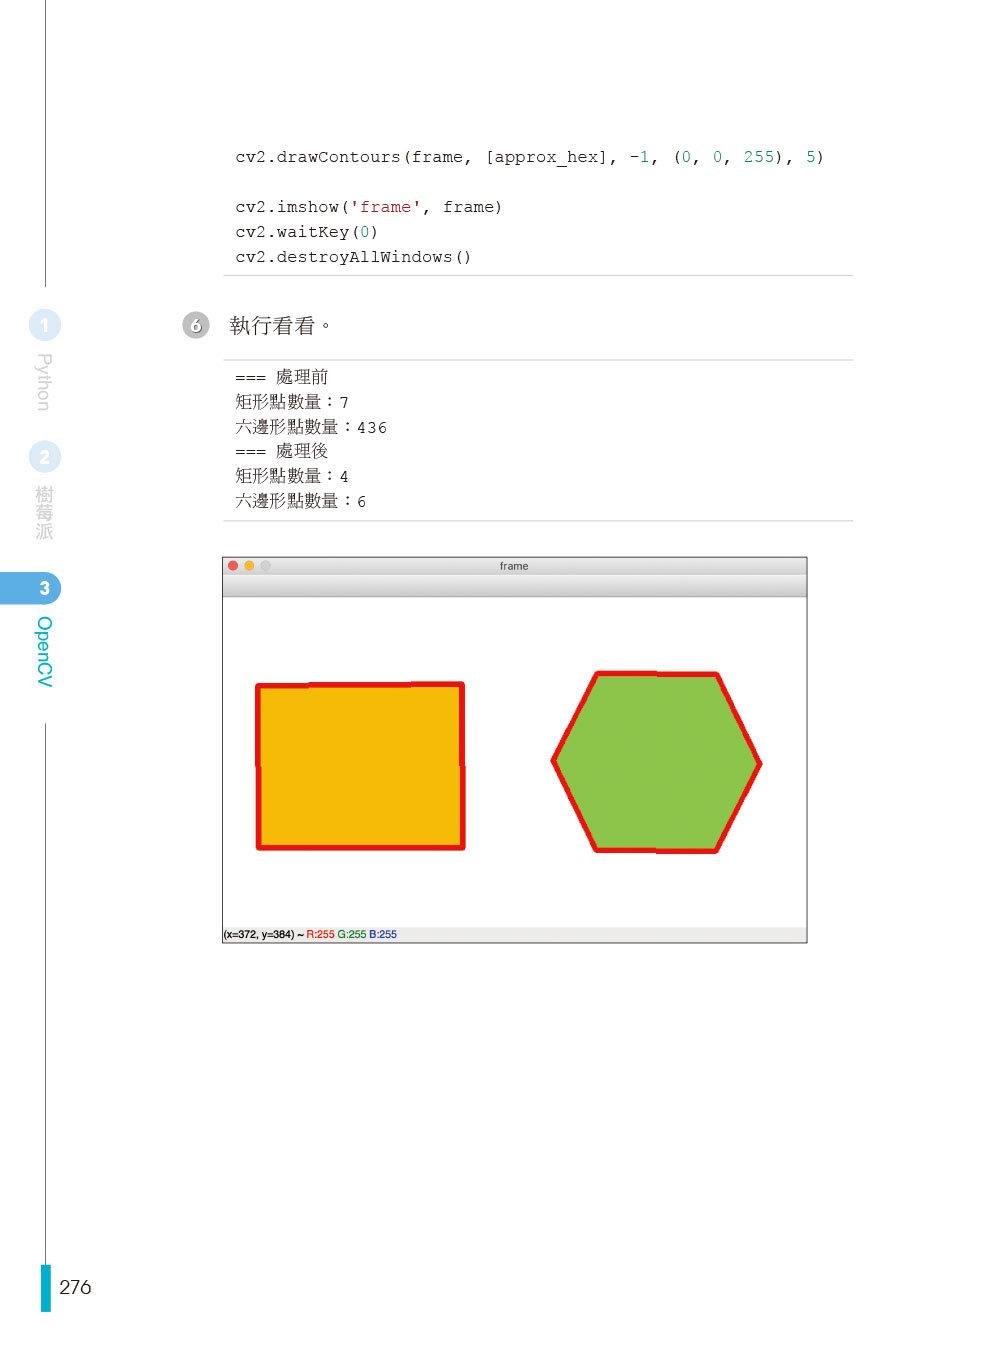 AIOT 與 OpenCV 實戰應用:Python、樹莓派、物聯網與機器視覺, 2/e-preview-9